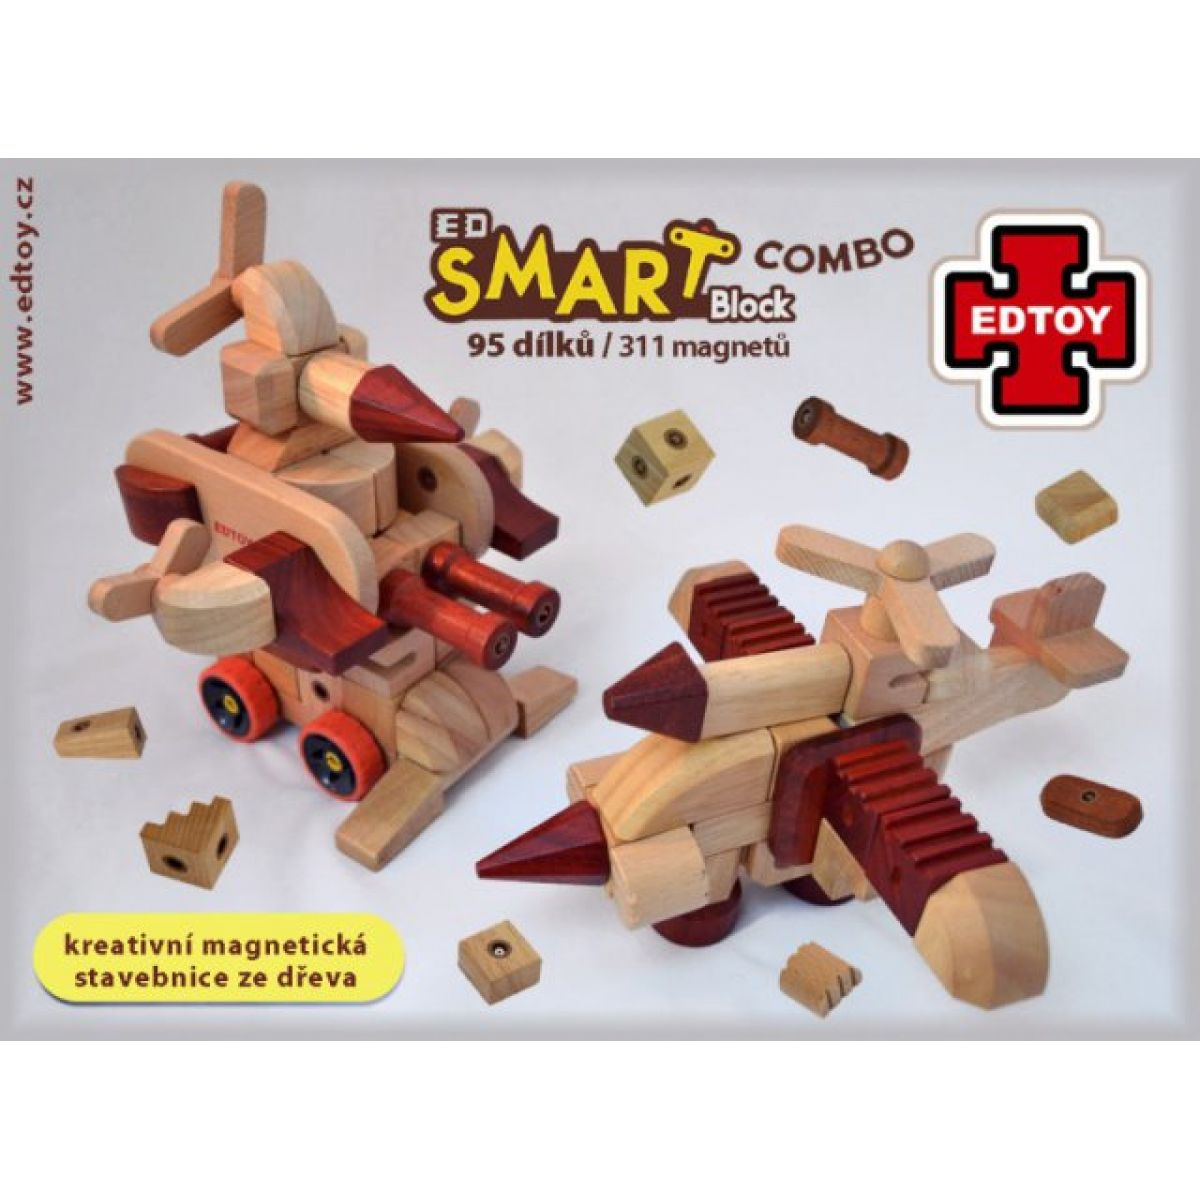 Edtoy SmartBlocks Combo